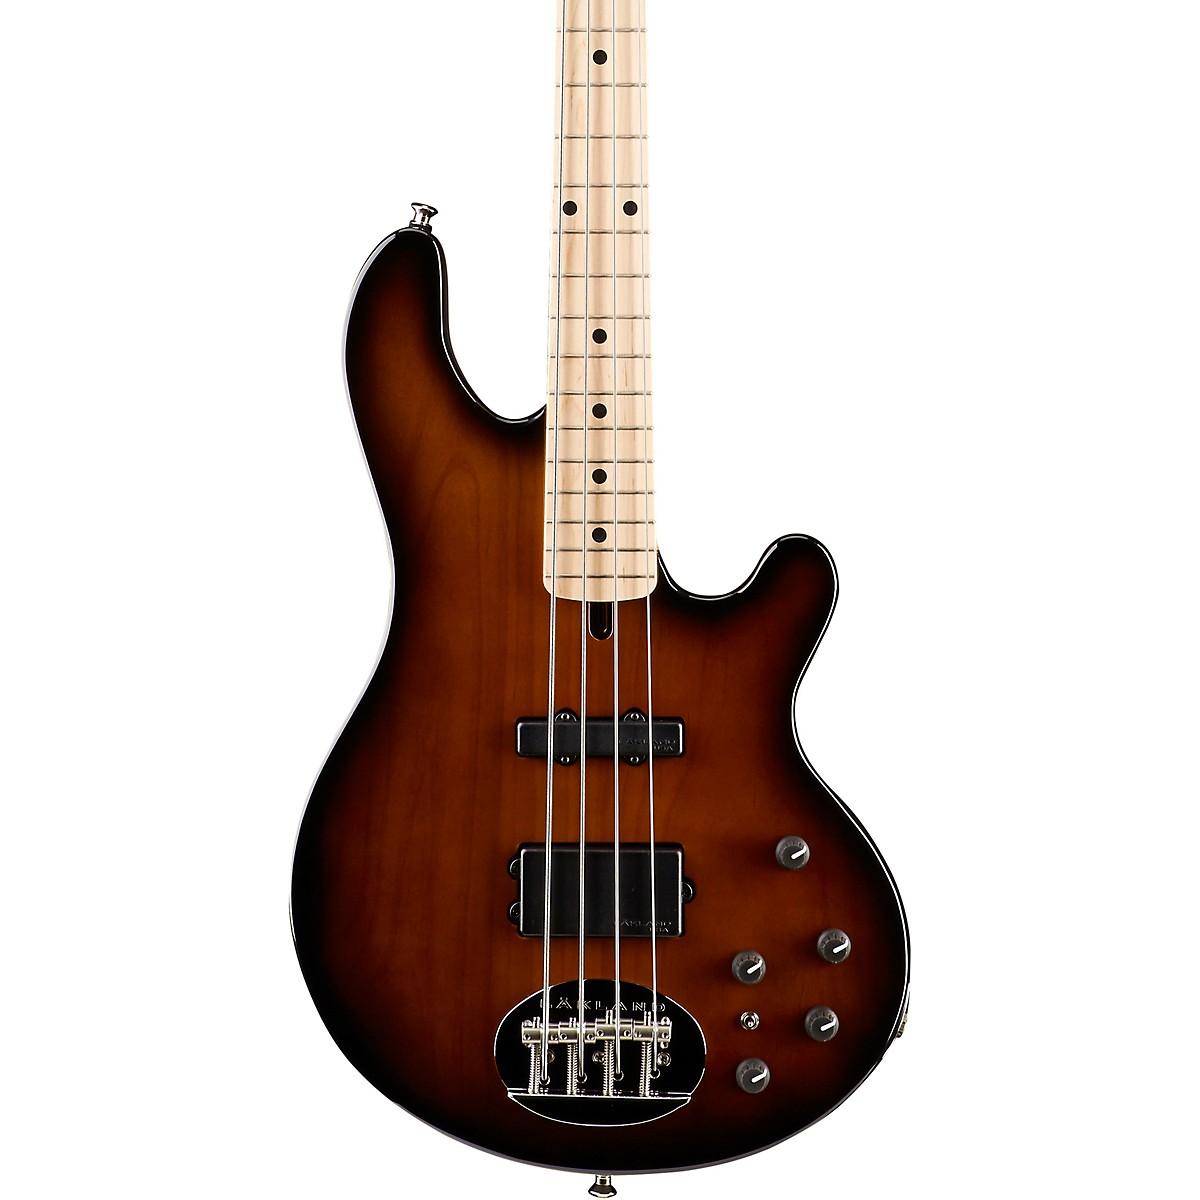 Lakland Classic 44-14 Maple Fretboard Electric Bass Guitar